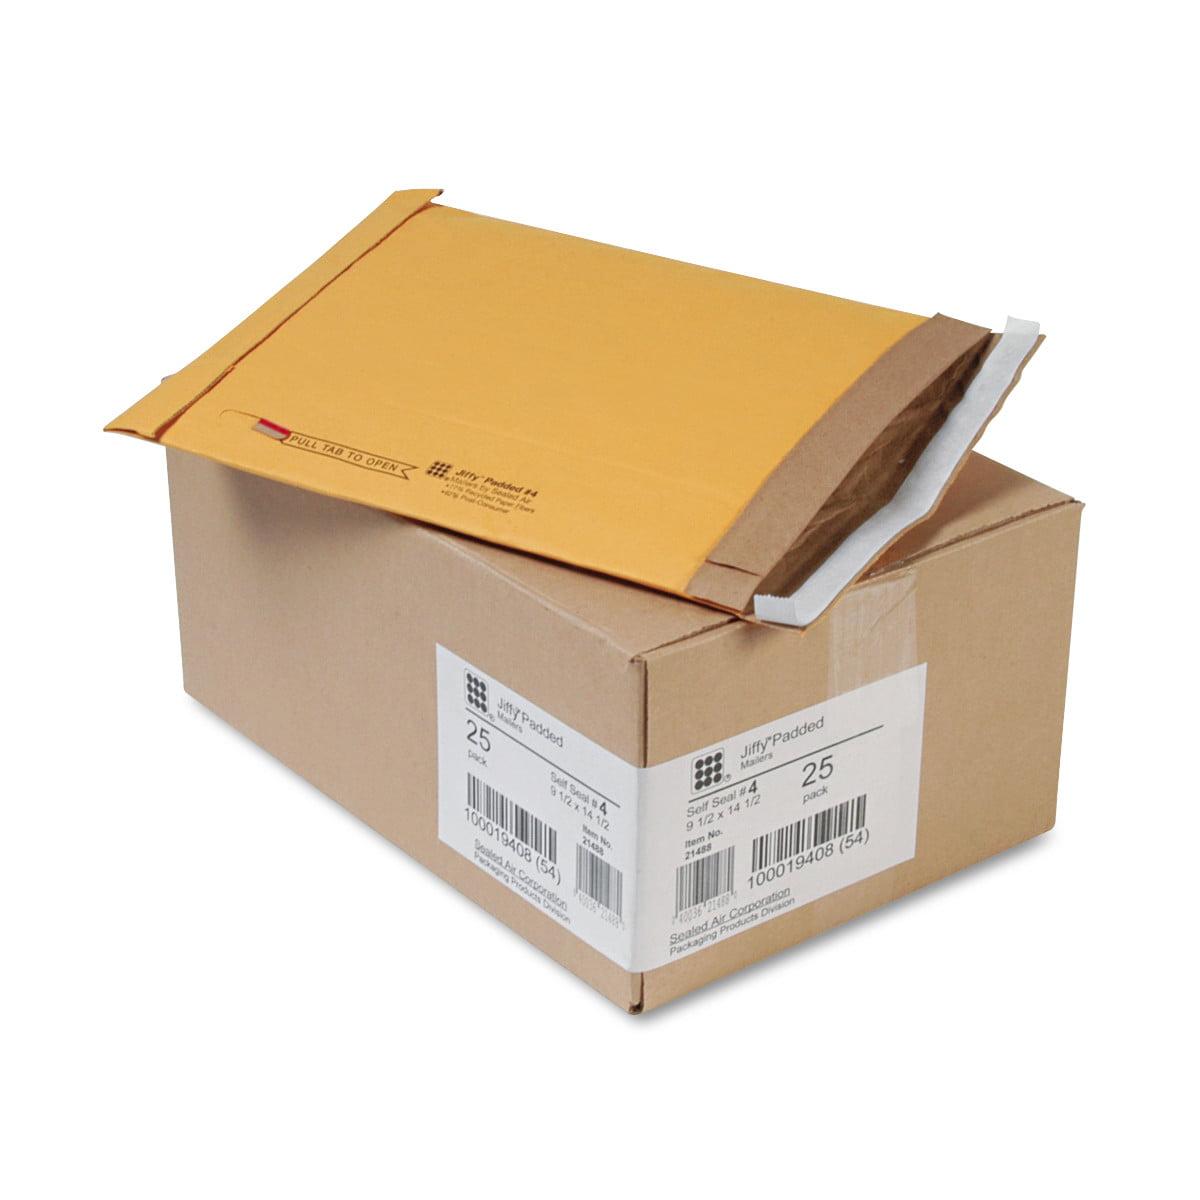 Sealed Air Jiffy Padded Self Seal Mailer, #4, 9 1/2 x 14 1/2, Natural Kraft, 25/Carton